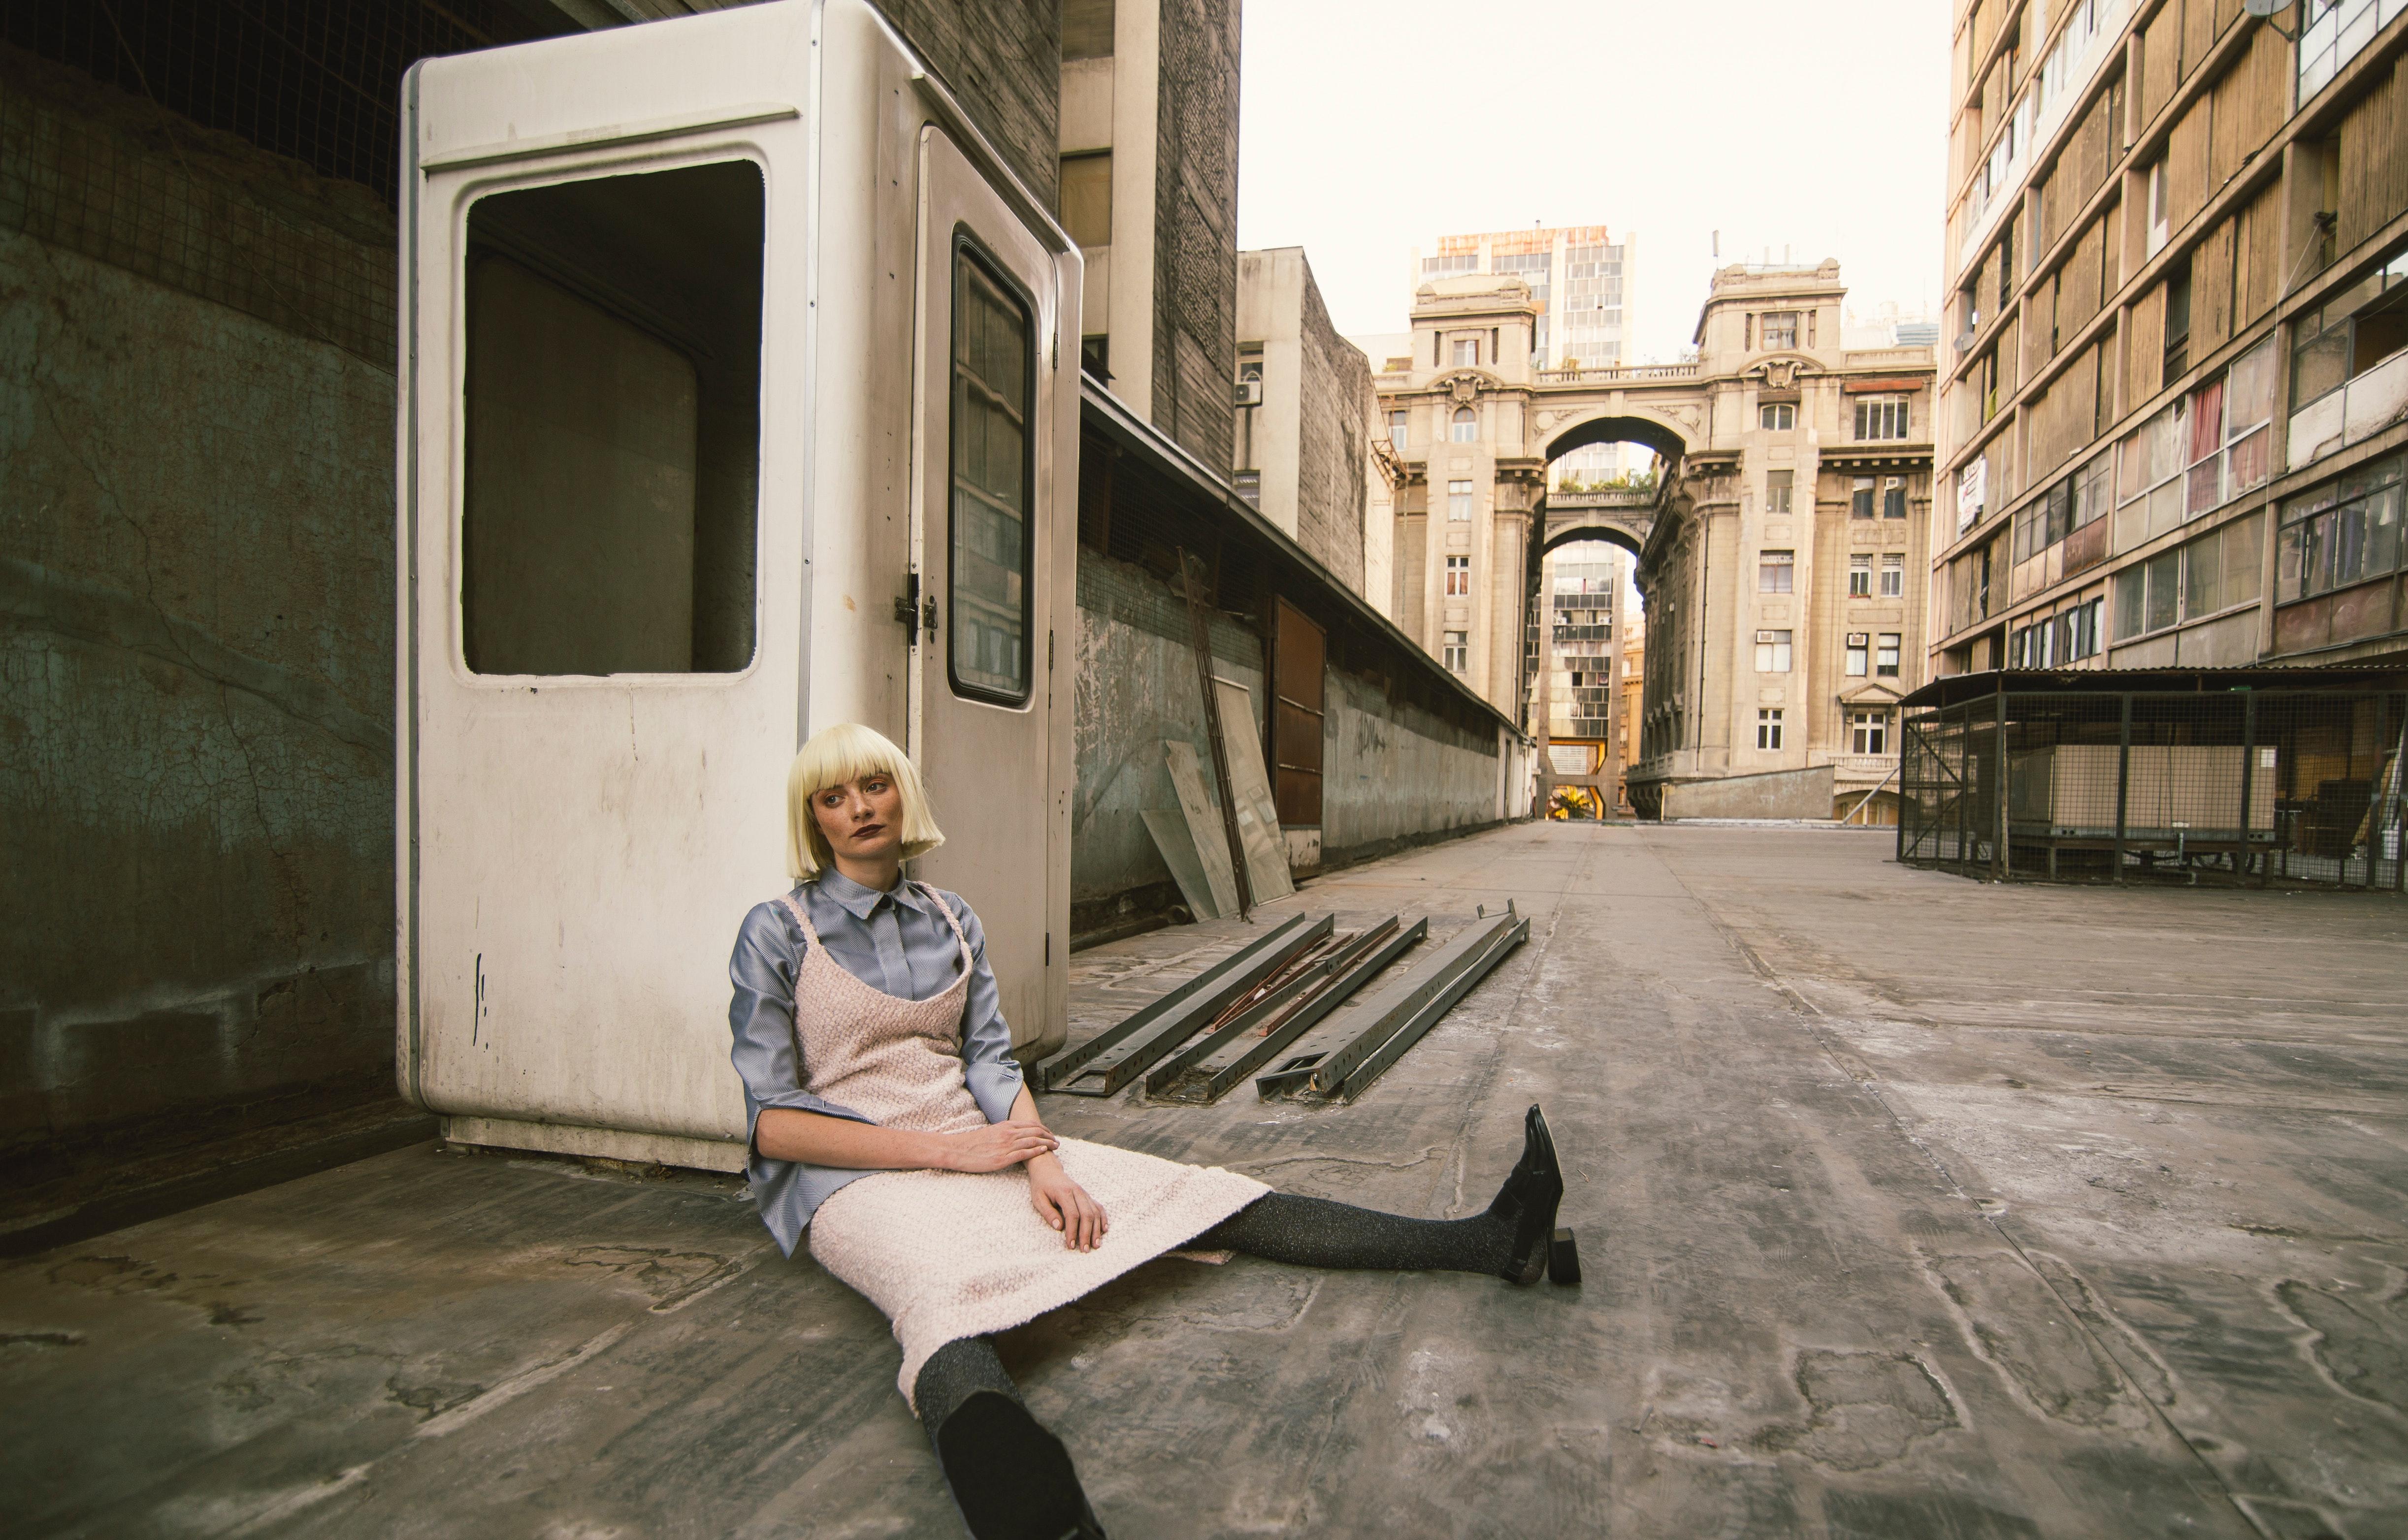 Woman Sitting on Road, Adult, Resting, Windows, Wear, HQ Photo